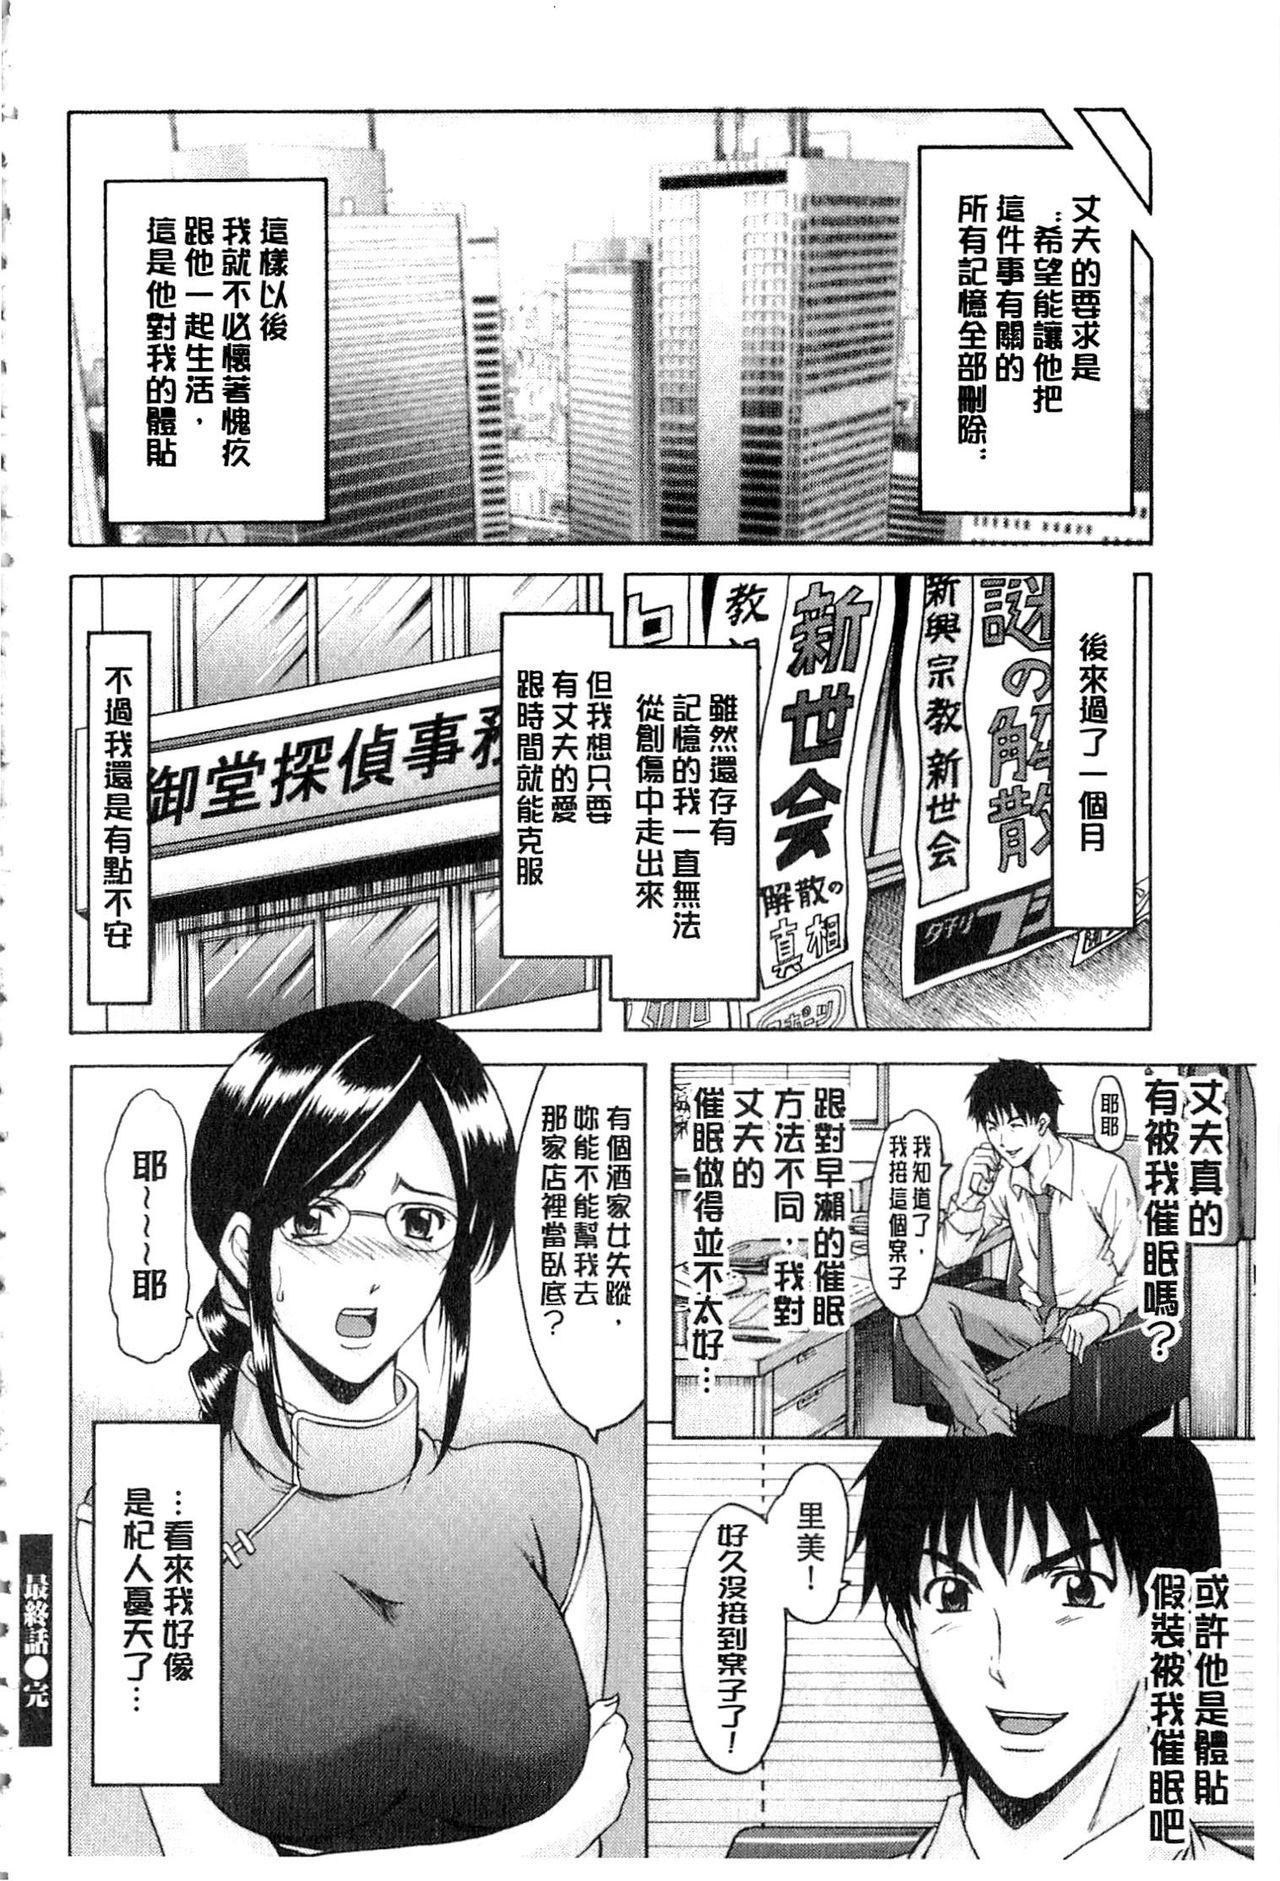 Sennyu Tsuma Satomi Kiroku   臥底人妻里美 洗腦凌辱的記錄 下集 160